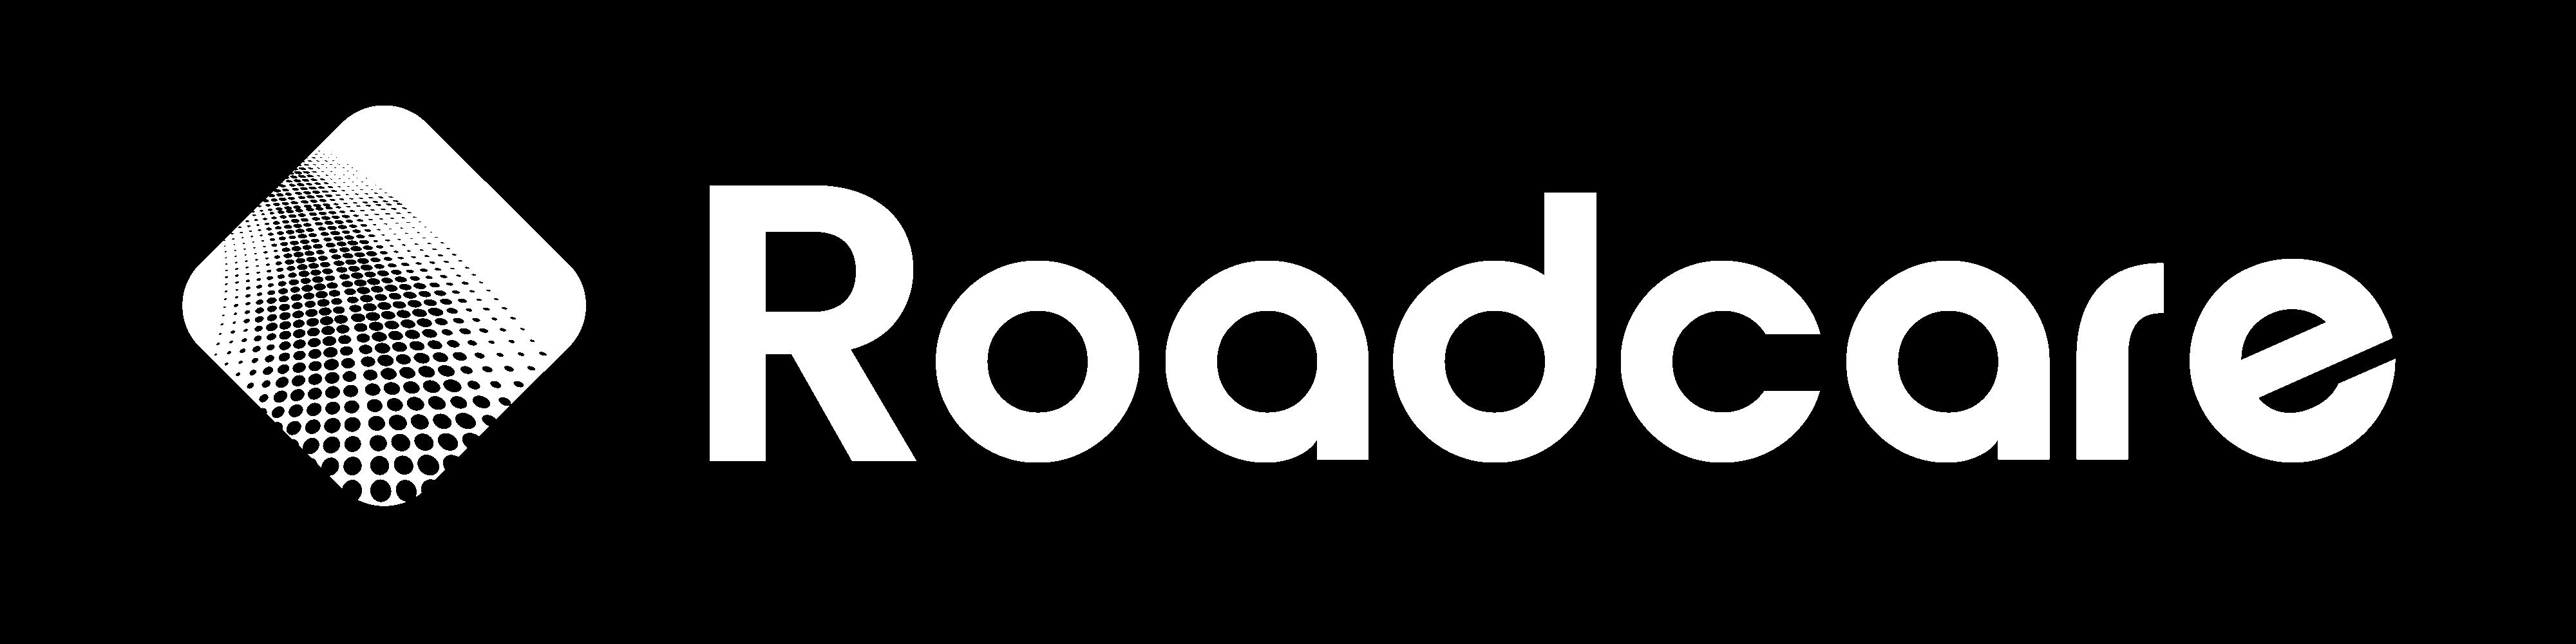 Roadcare logo